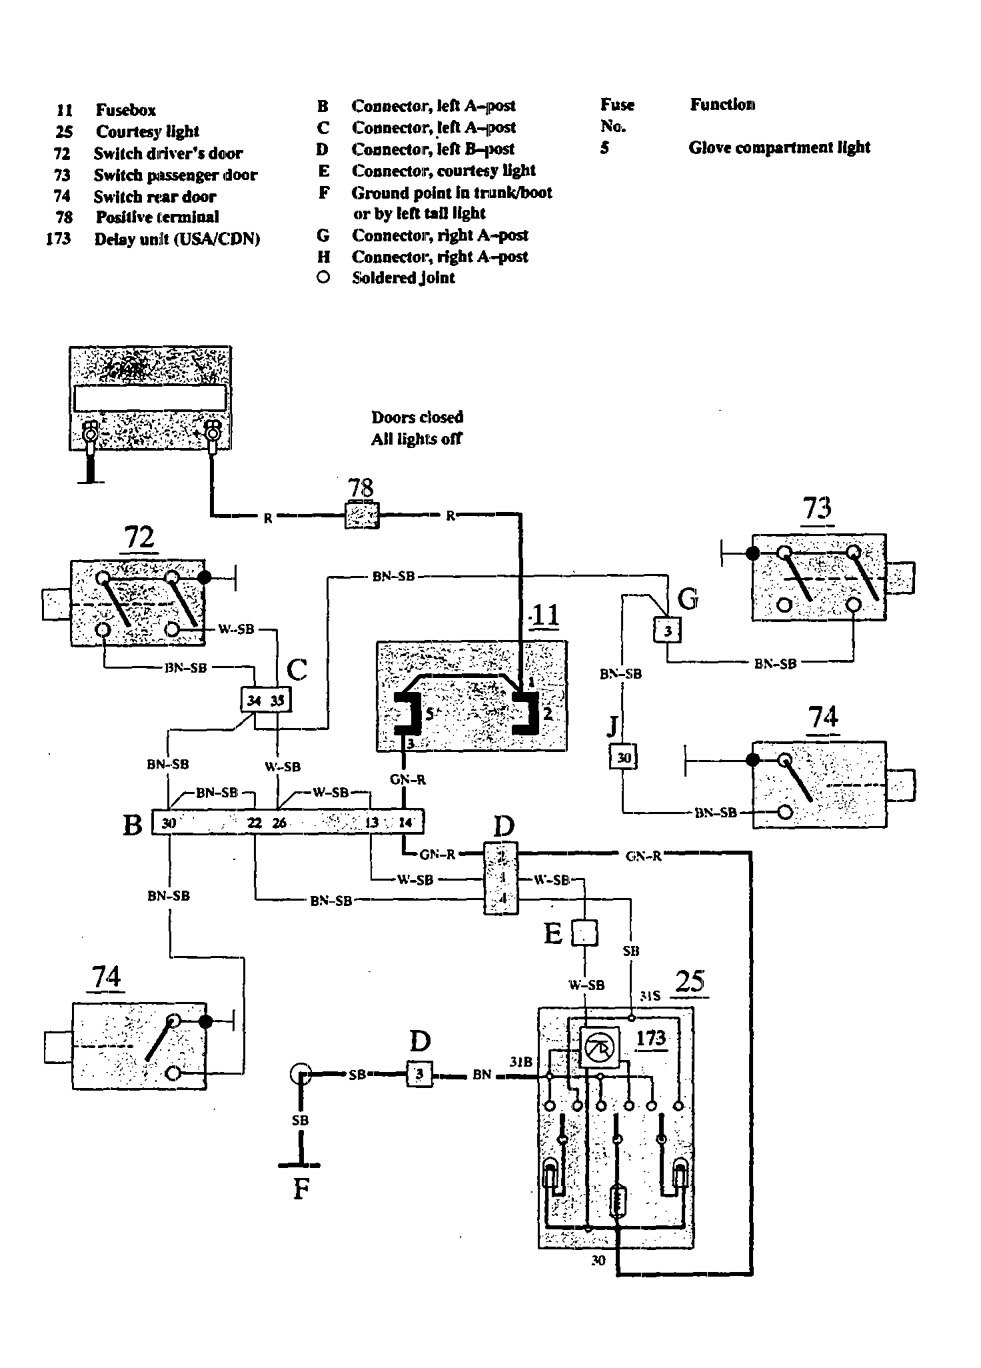 volvo 940 engine diagram 1996 7 3 powerstroke glow plug relay wiring jeep comanche best library 1991 1998 cherokee 1994 1993